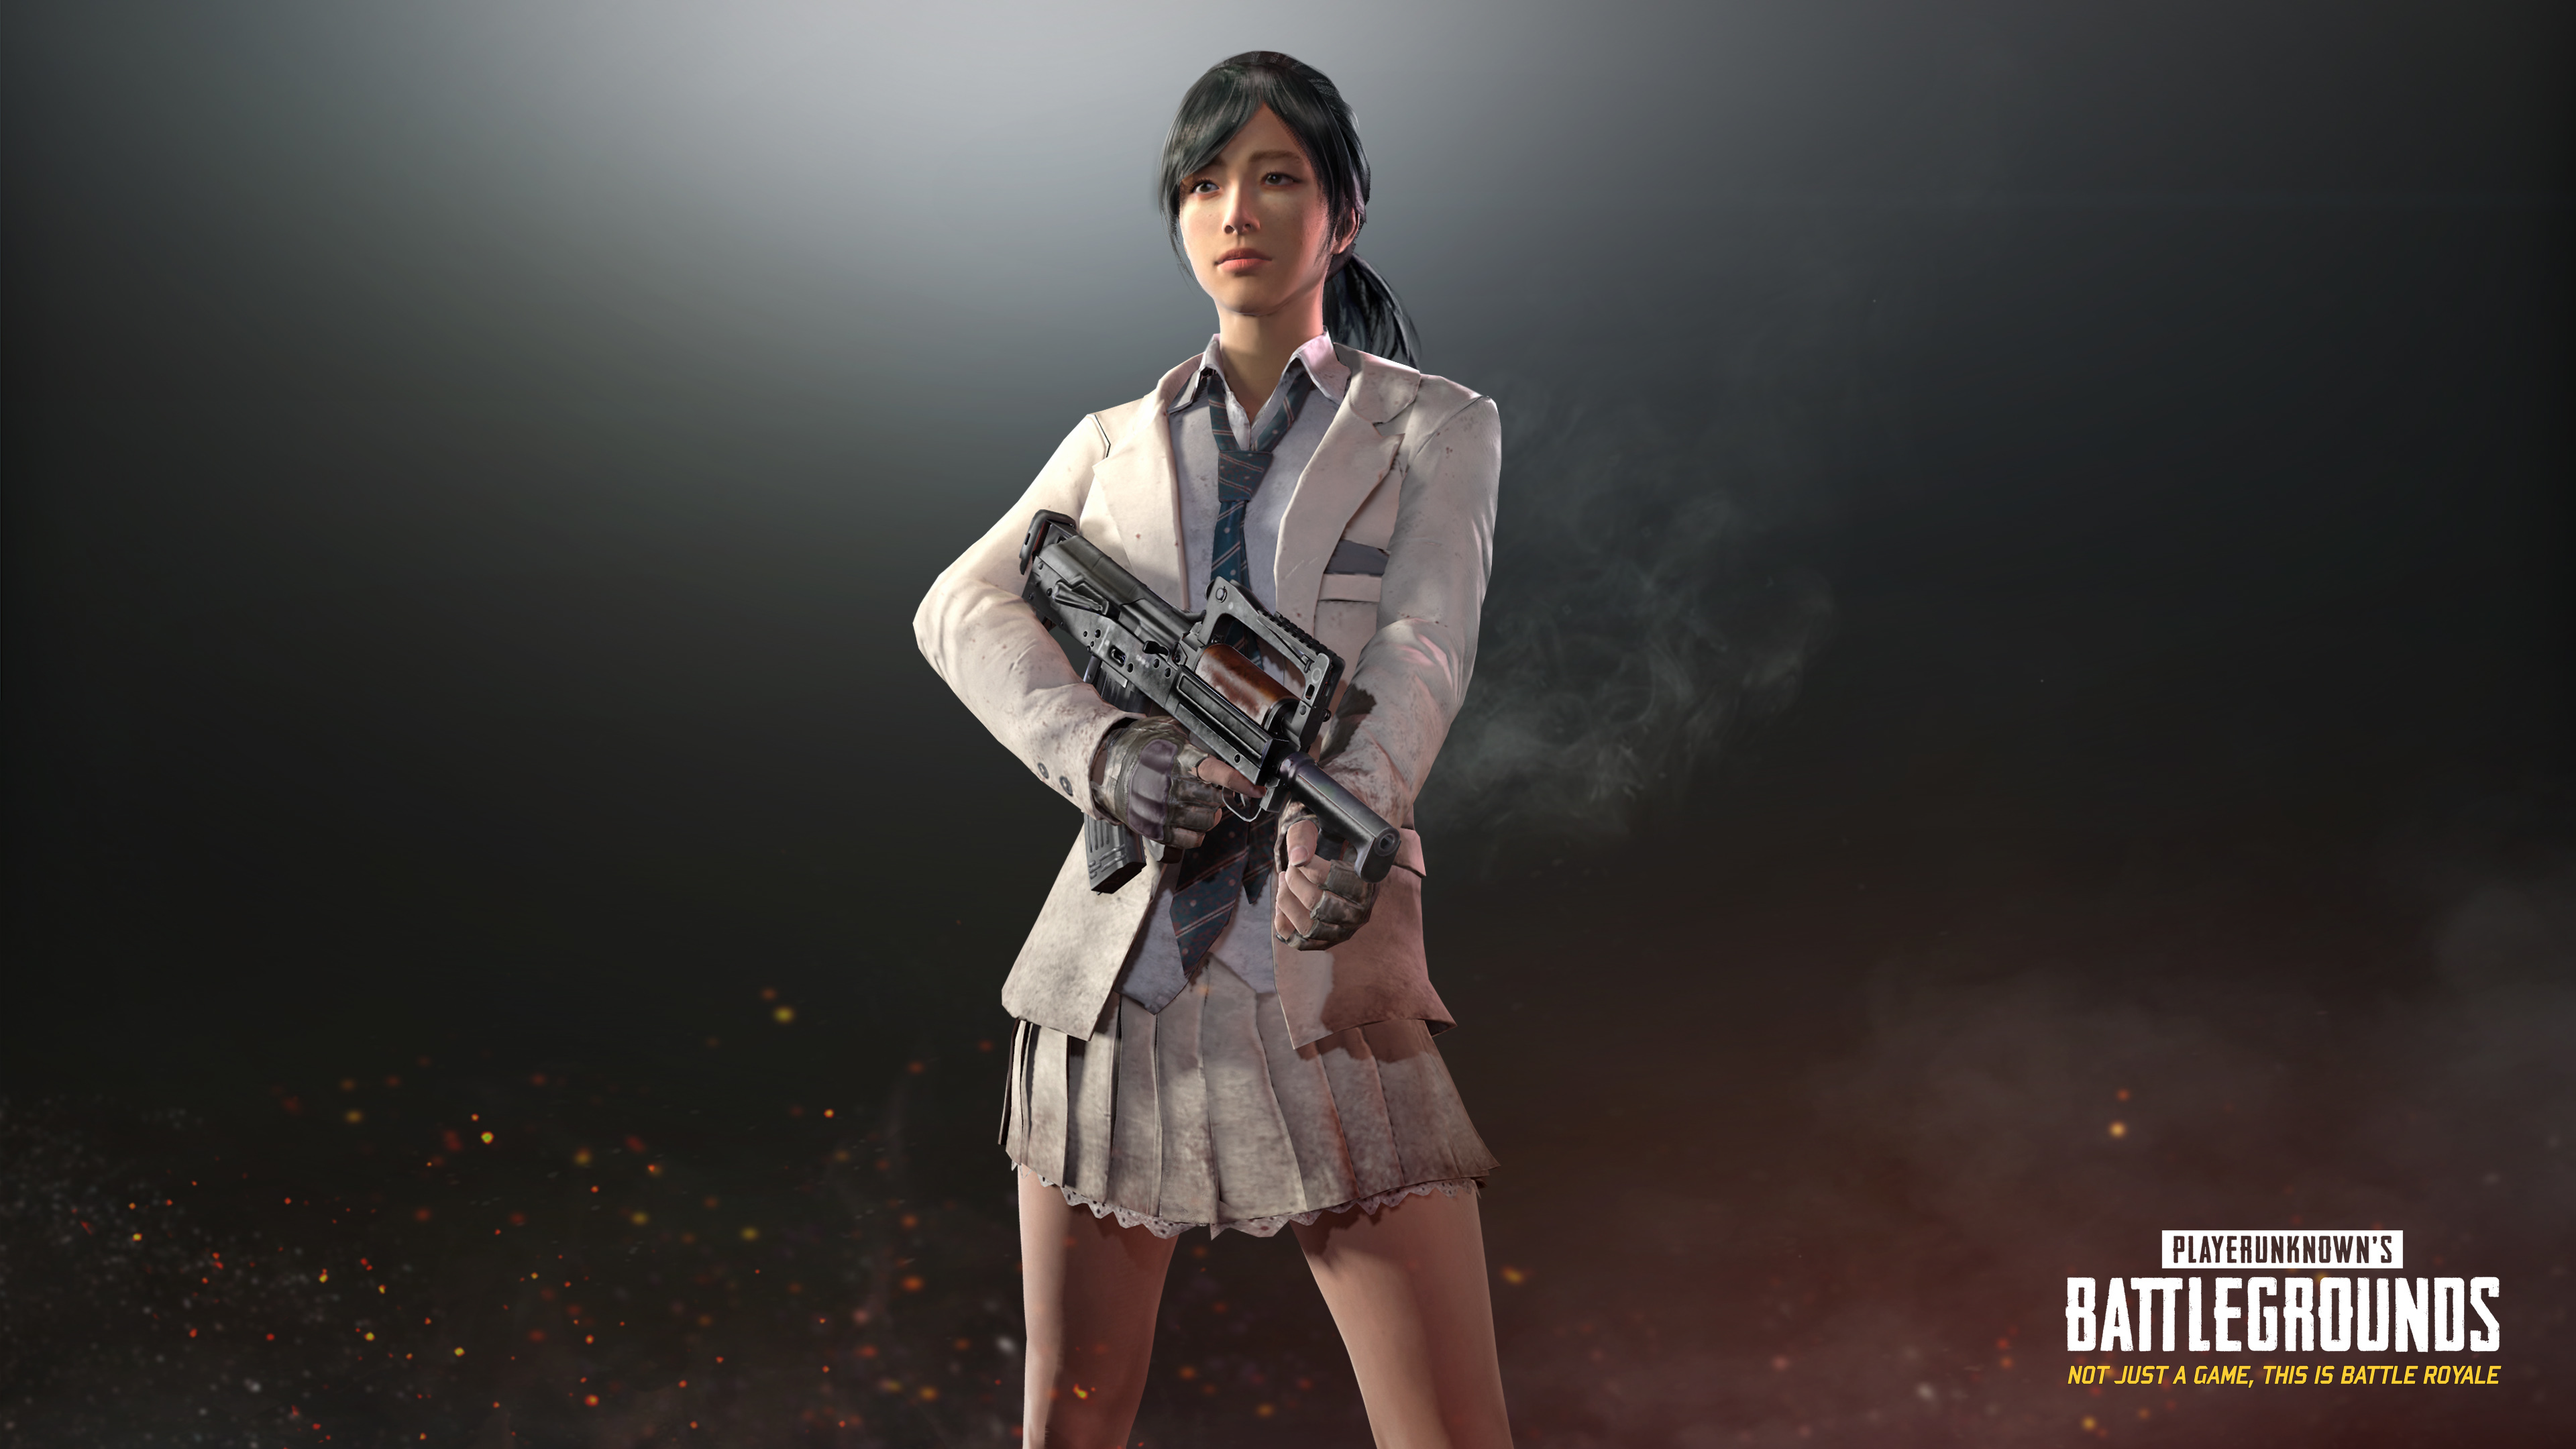 Playerunknowns Battlegrounds A Weekly Patch New Skins Gamescom